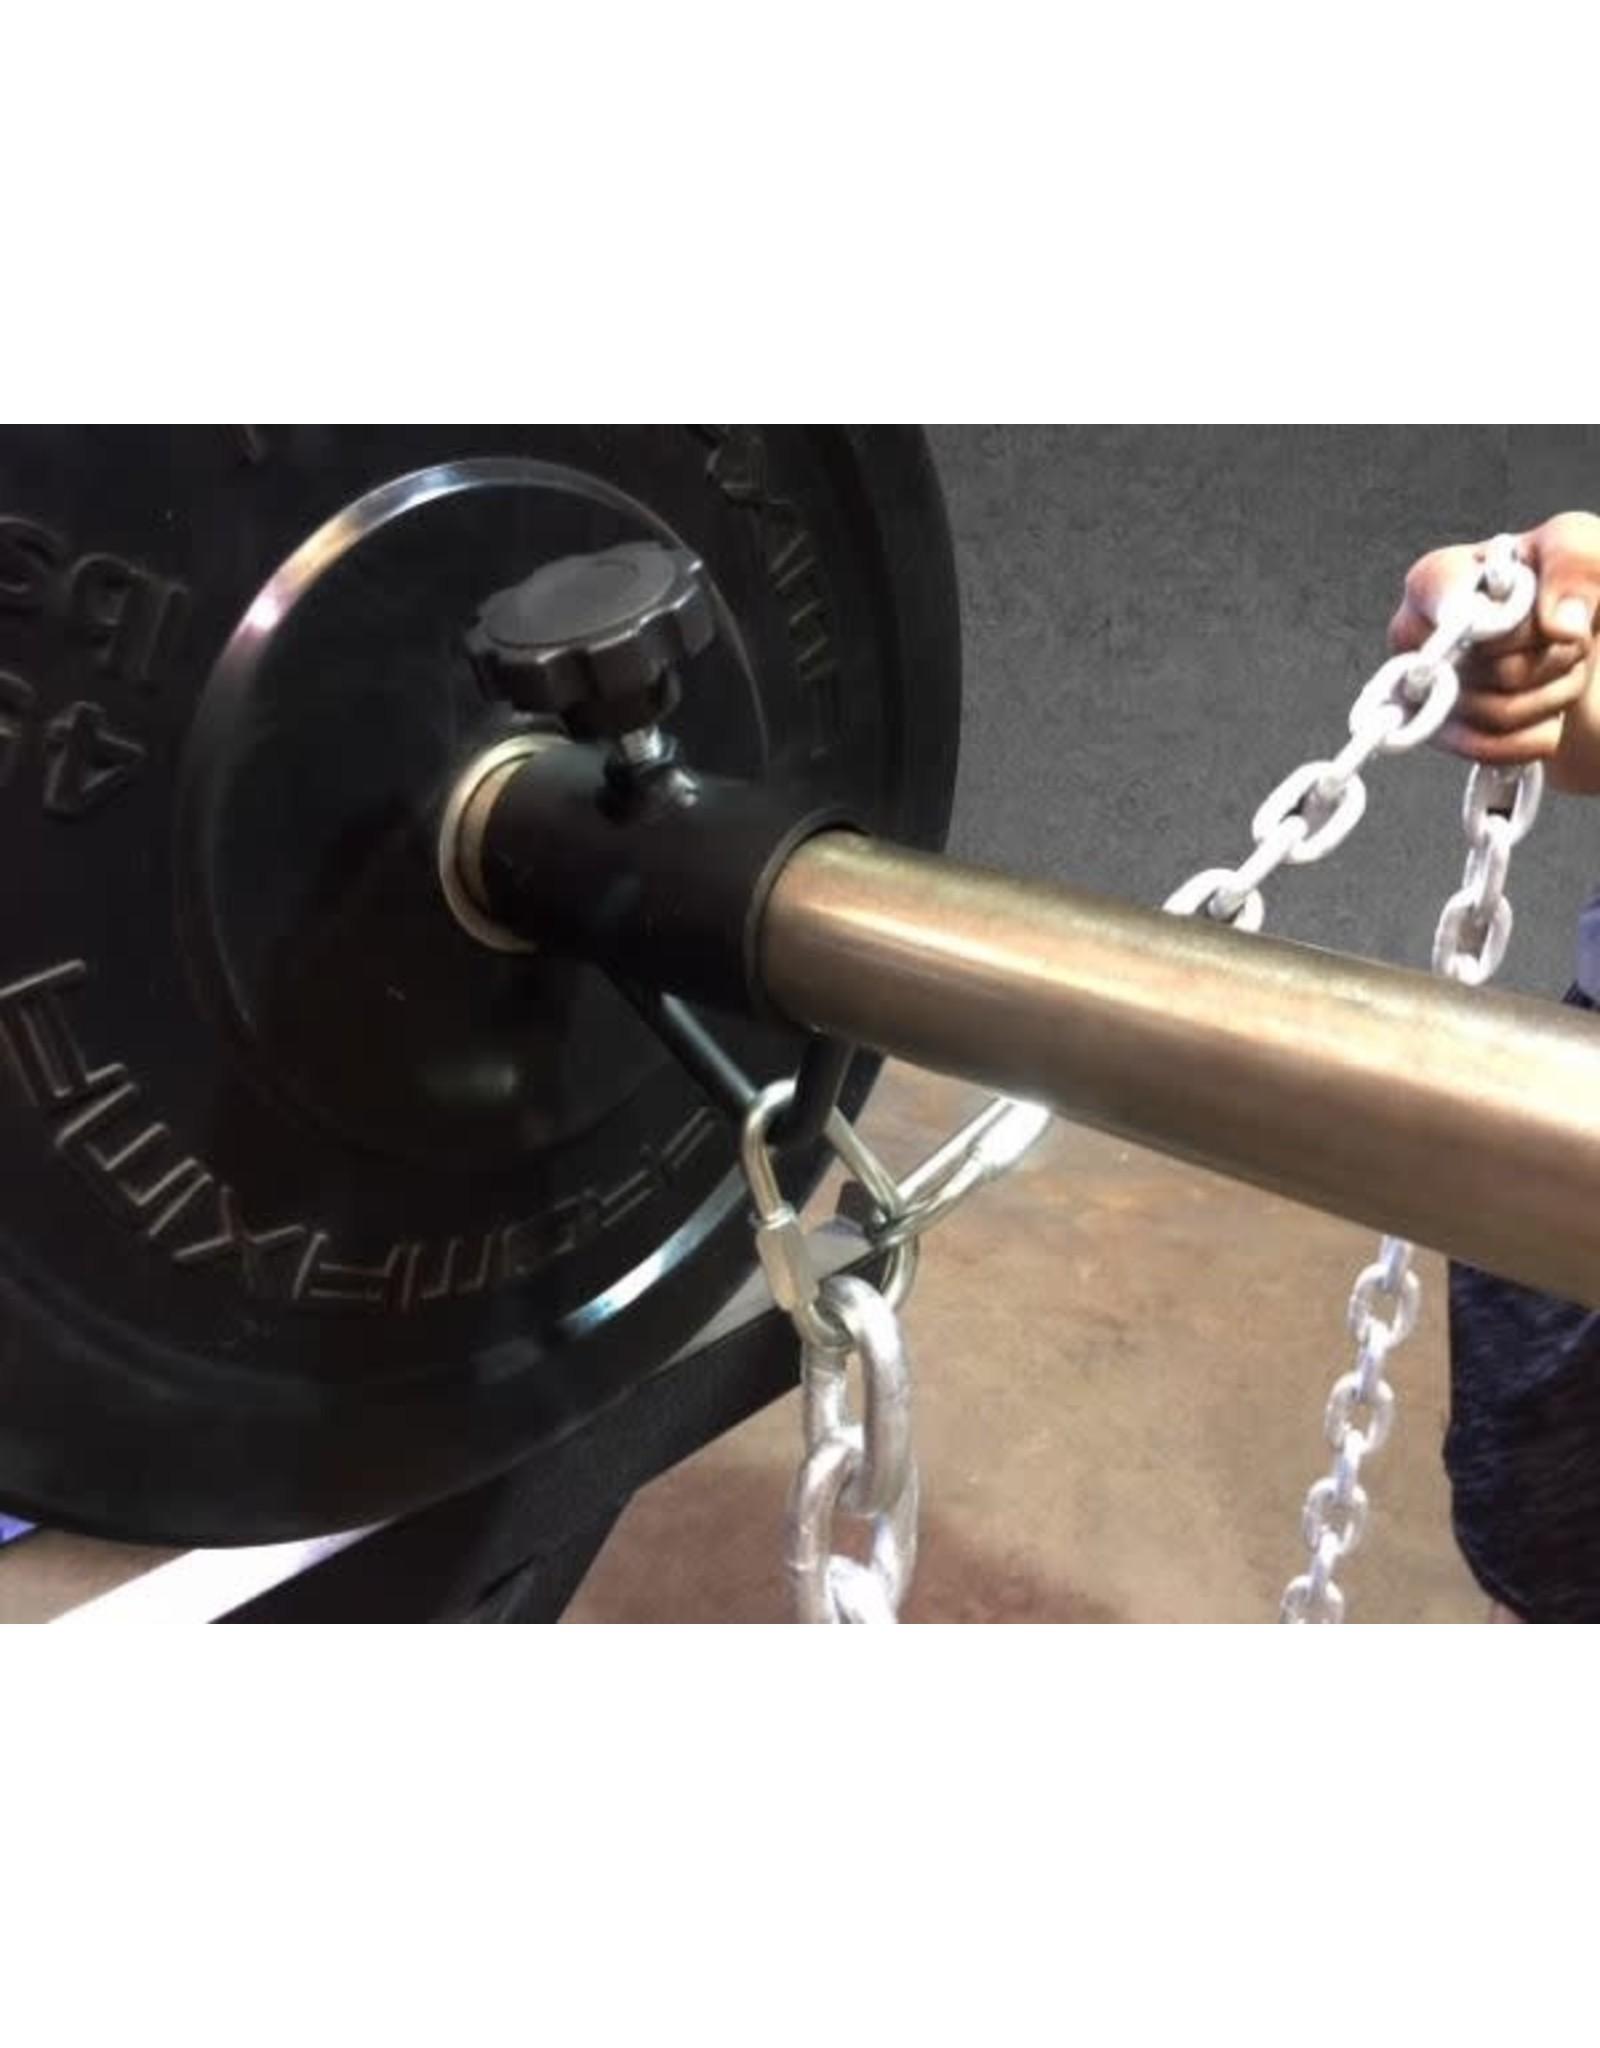 PROMAXIMA PROMAXIMA Lifting Chains